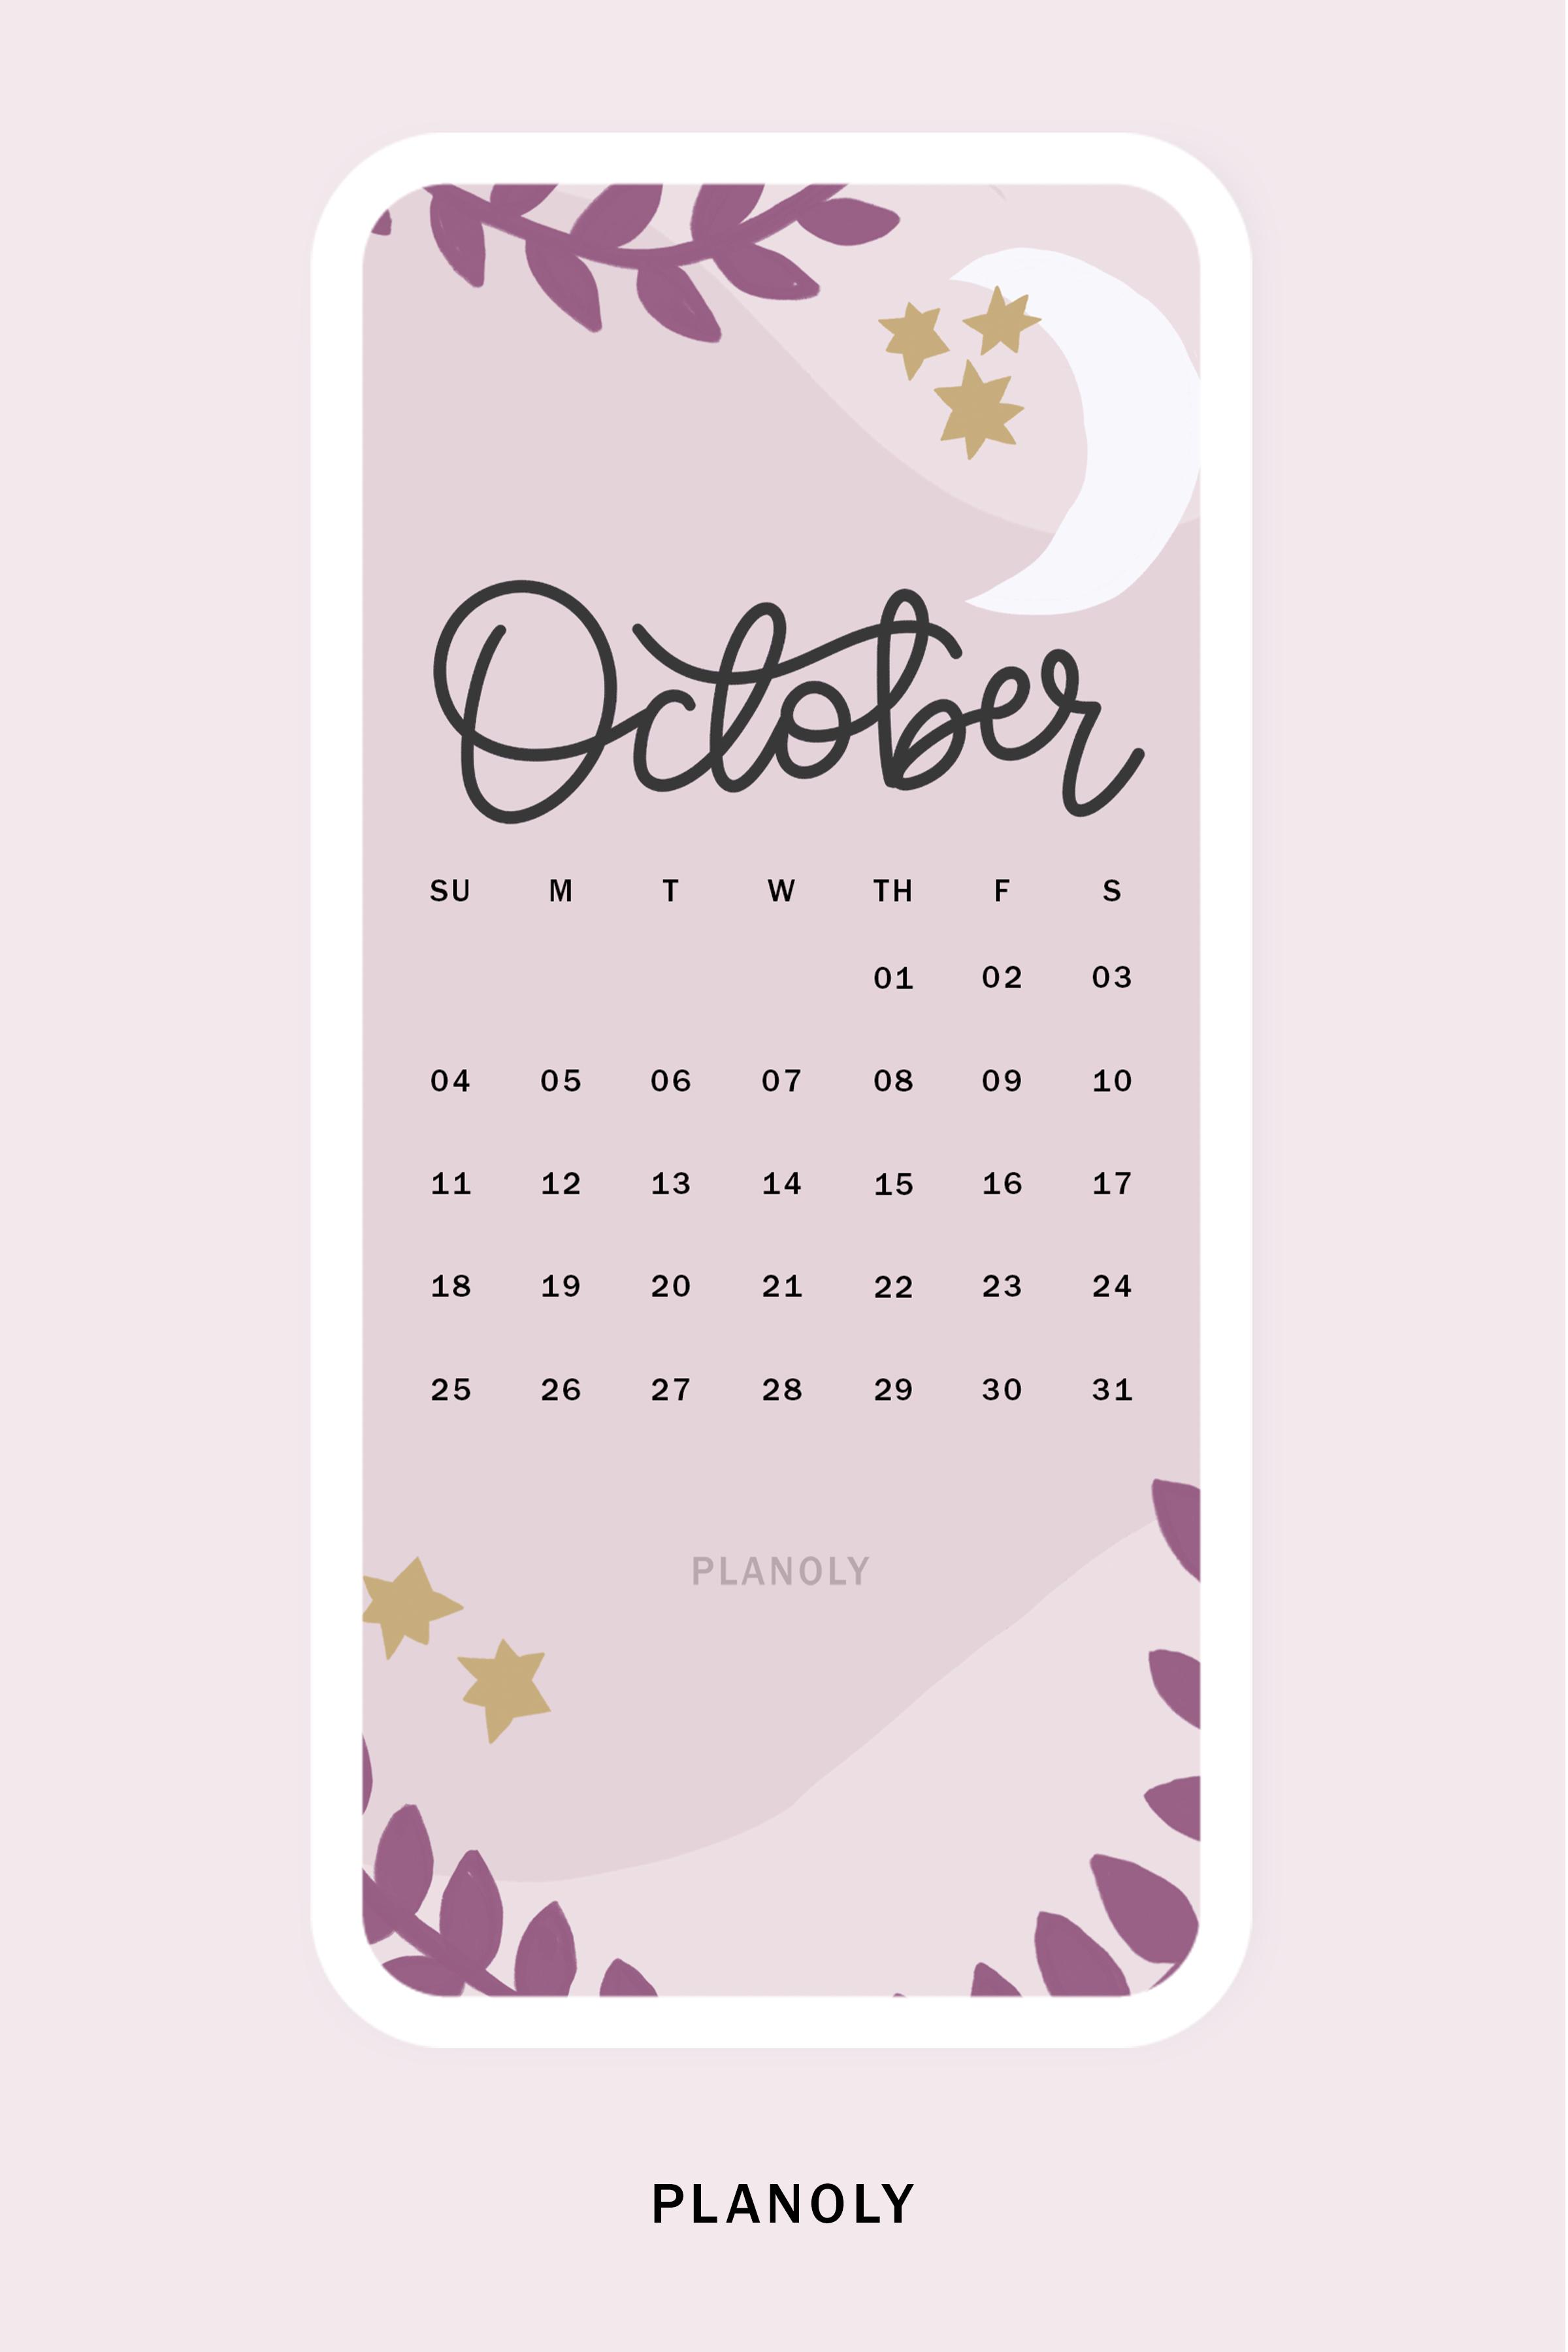 PLANOLY-blog post-Q4 2020 Content Calendars- Image 1